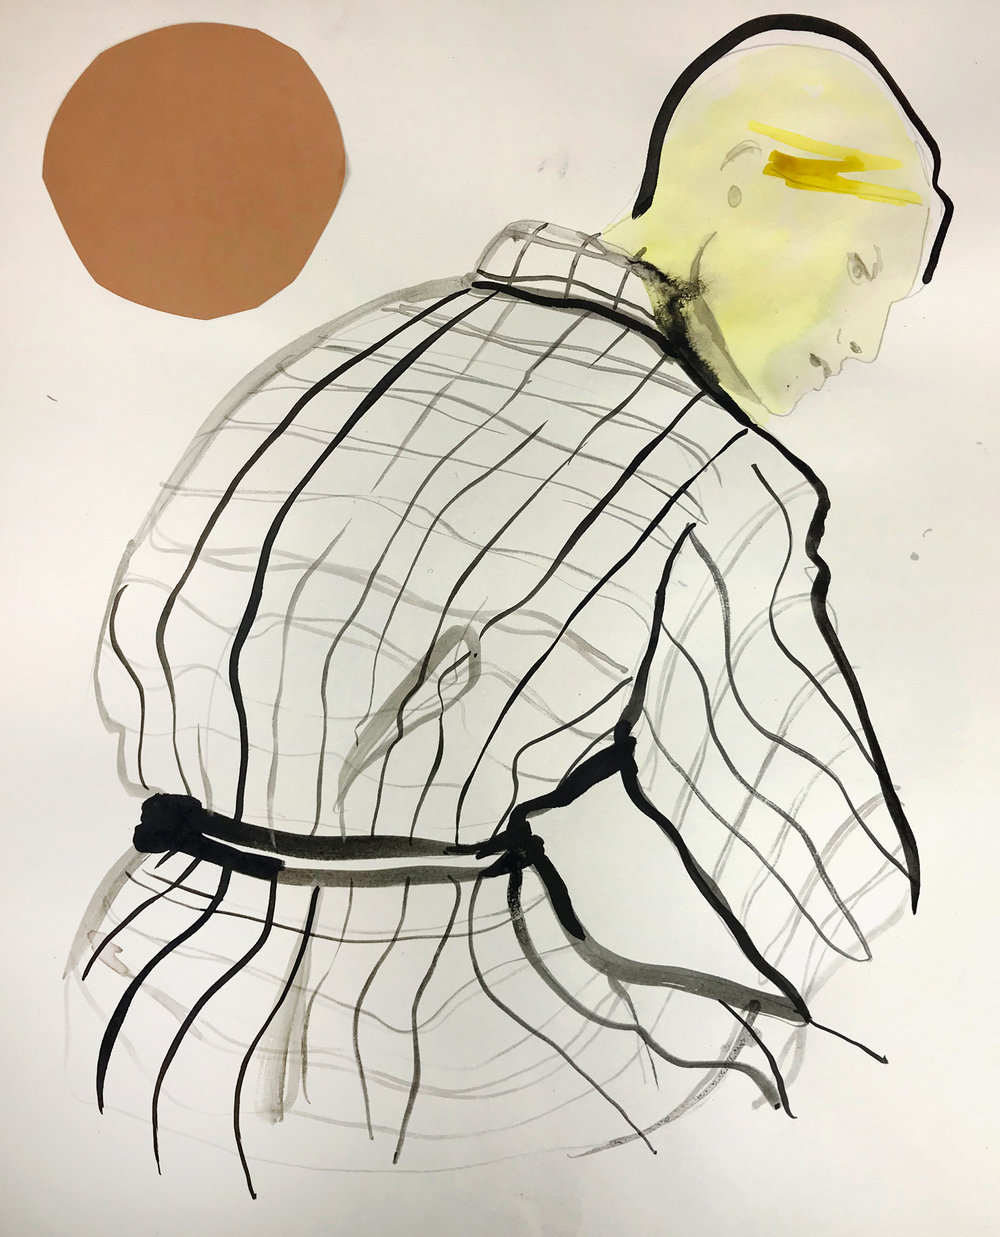 stina-persson-illustration-showstudio-tibi-01.jpg